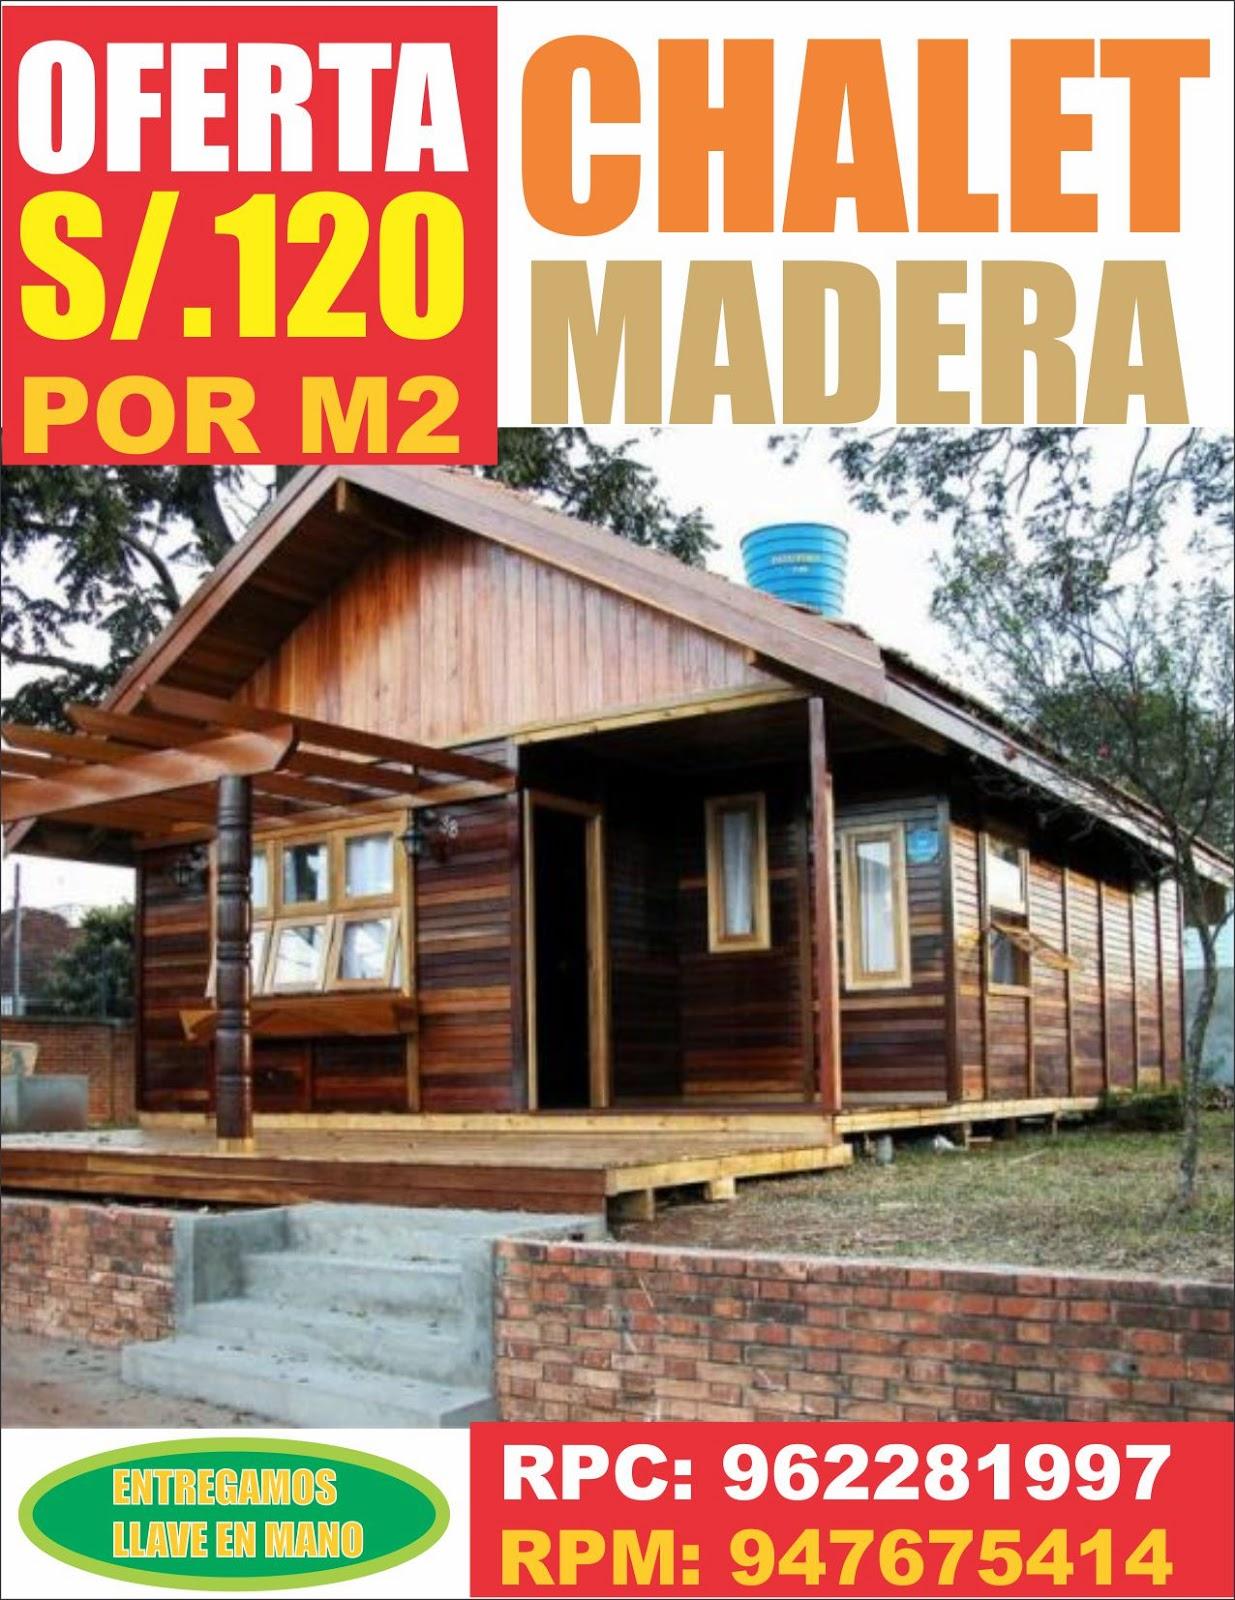 Casas pre fabricadas de madera en lima per - Precio casas de madera prefabricadas ...